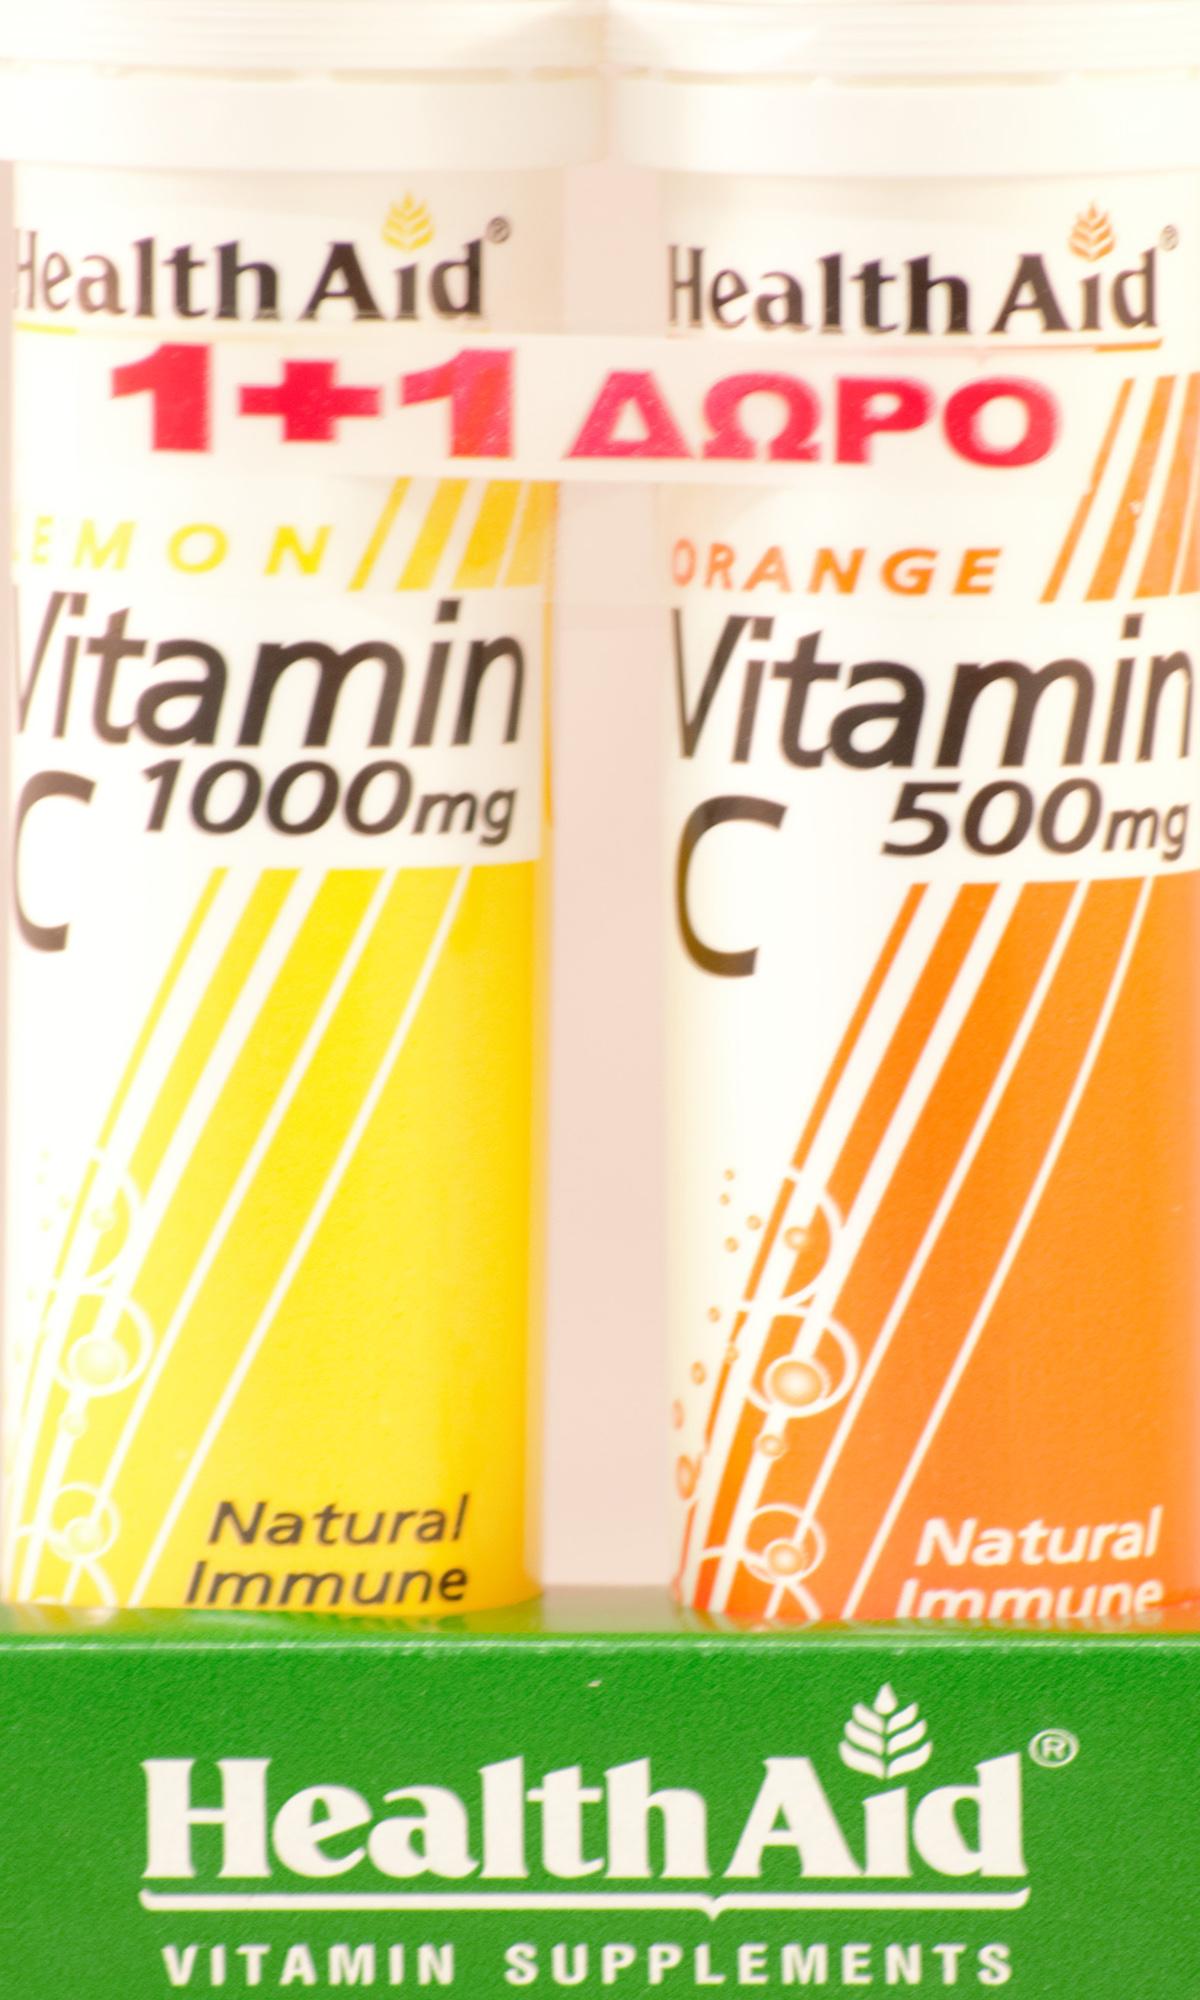 Health Aid Vitamin C 1000mg Γεύση Λεμόνι 20αναβράζ.ταμπλέτες + Δώρο Vitamin C Orange 500mg 20αναβρ.δισκία